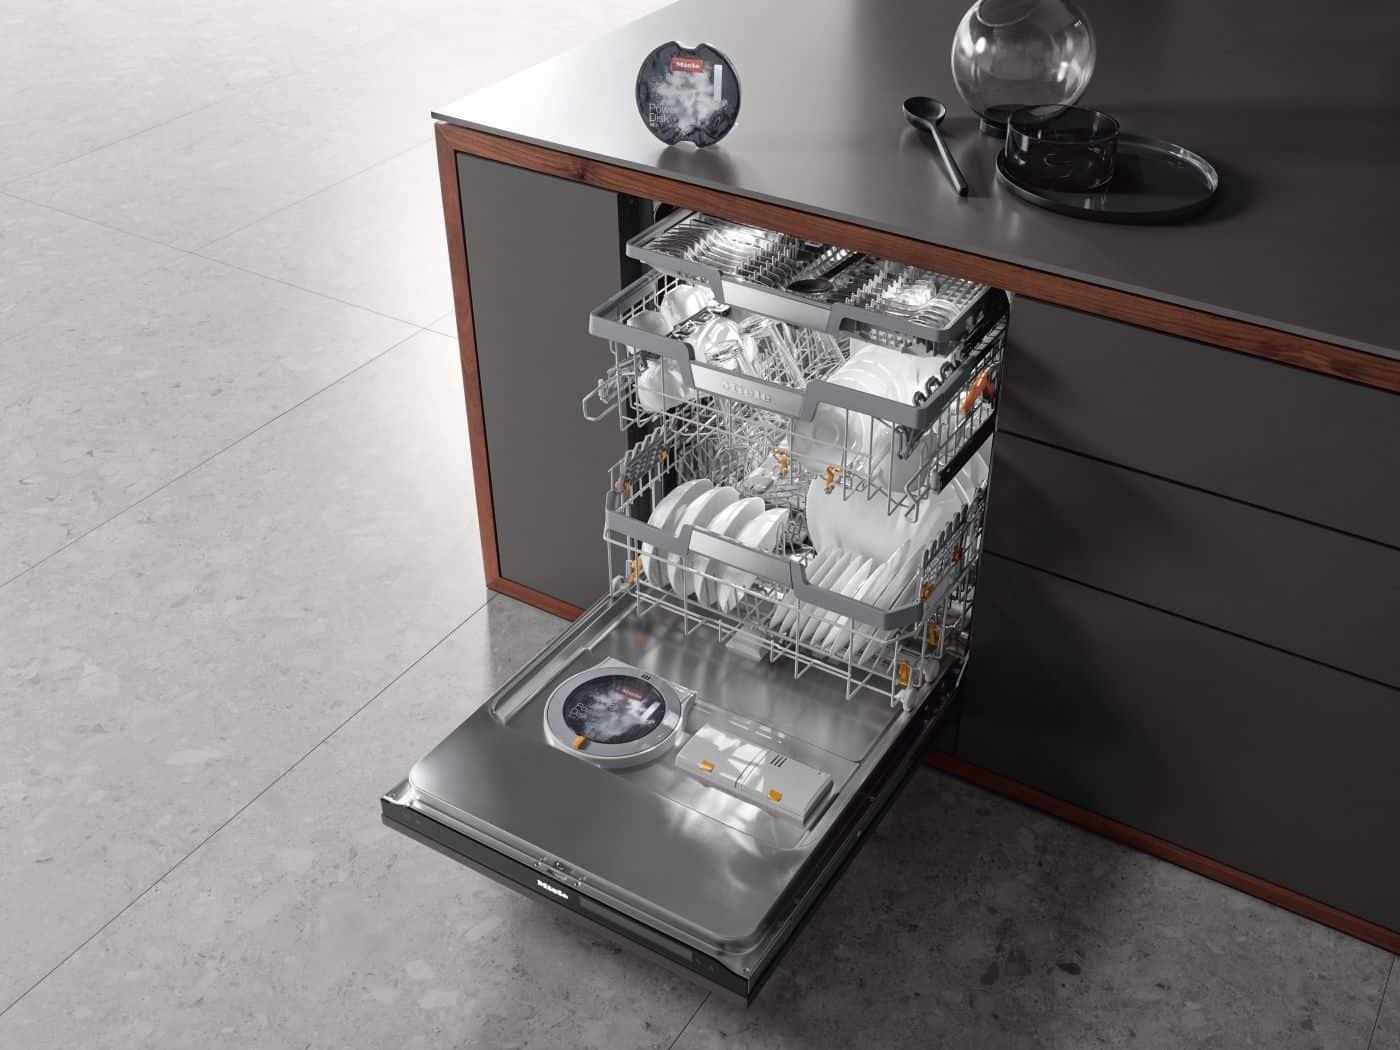 KBIS 2020 winners - Miele G 7000 Dishwasher by Miele Inc